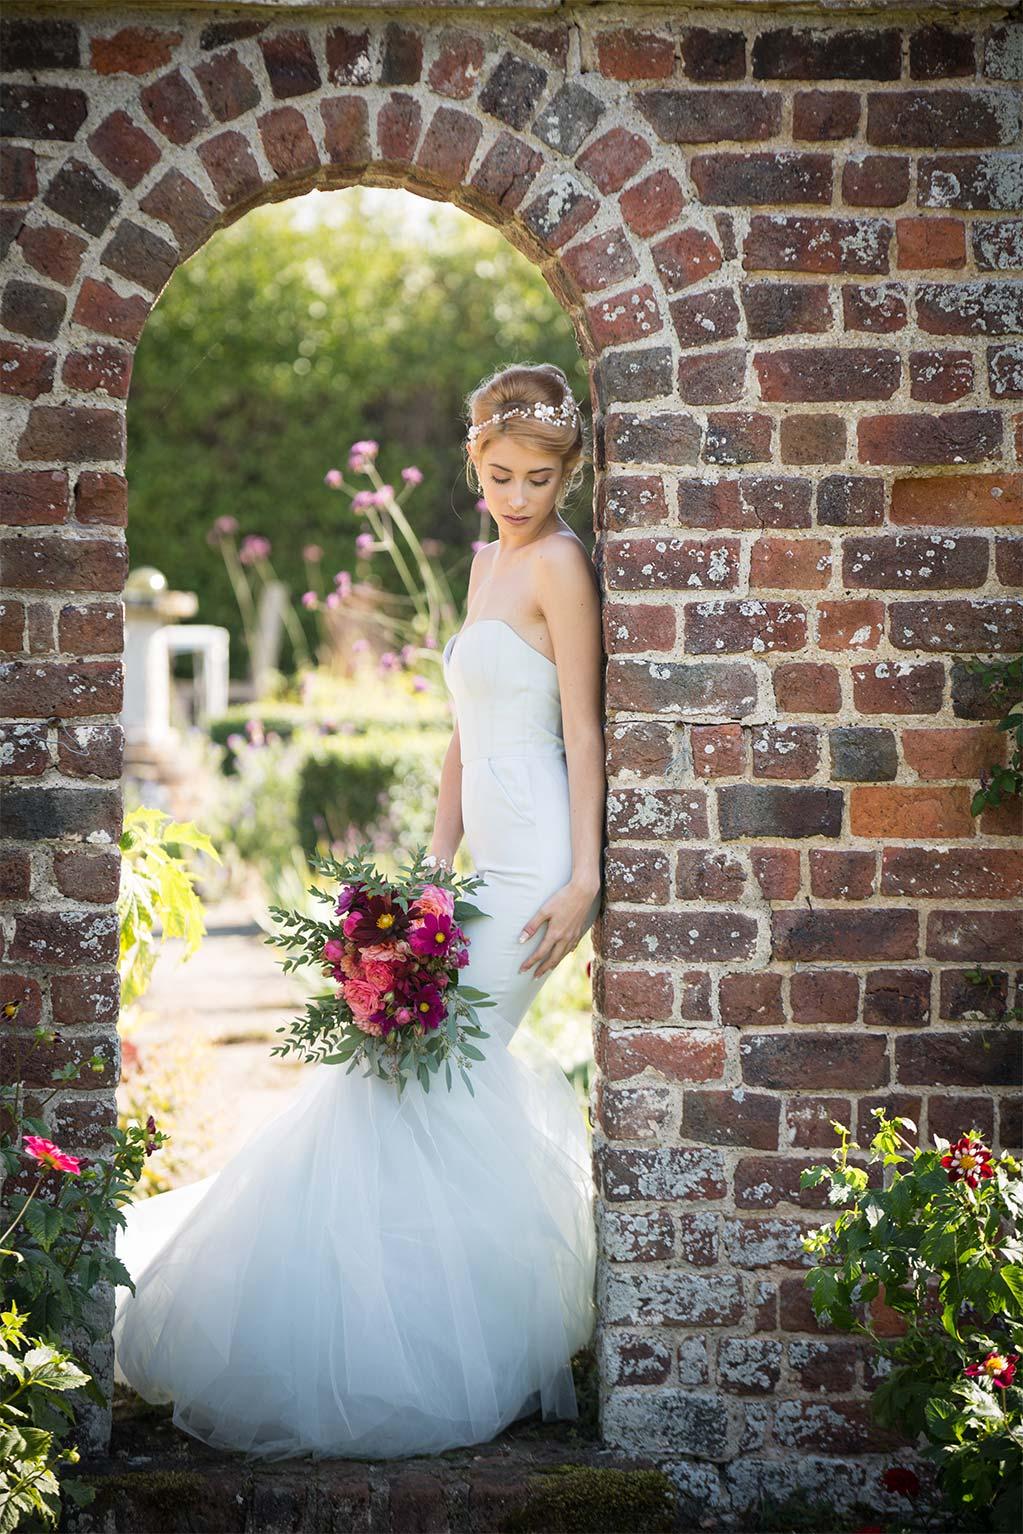 Weddings at Midelney Manor